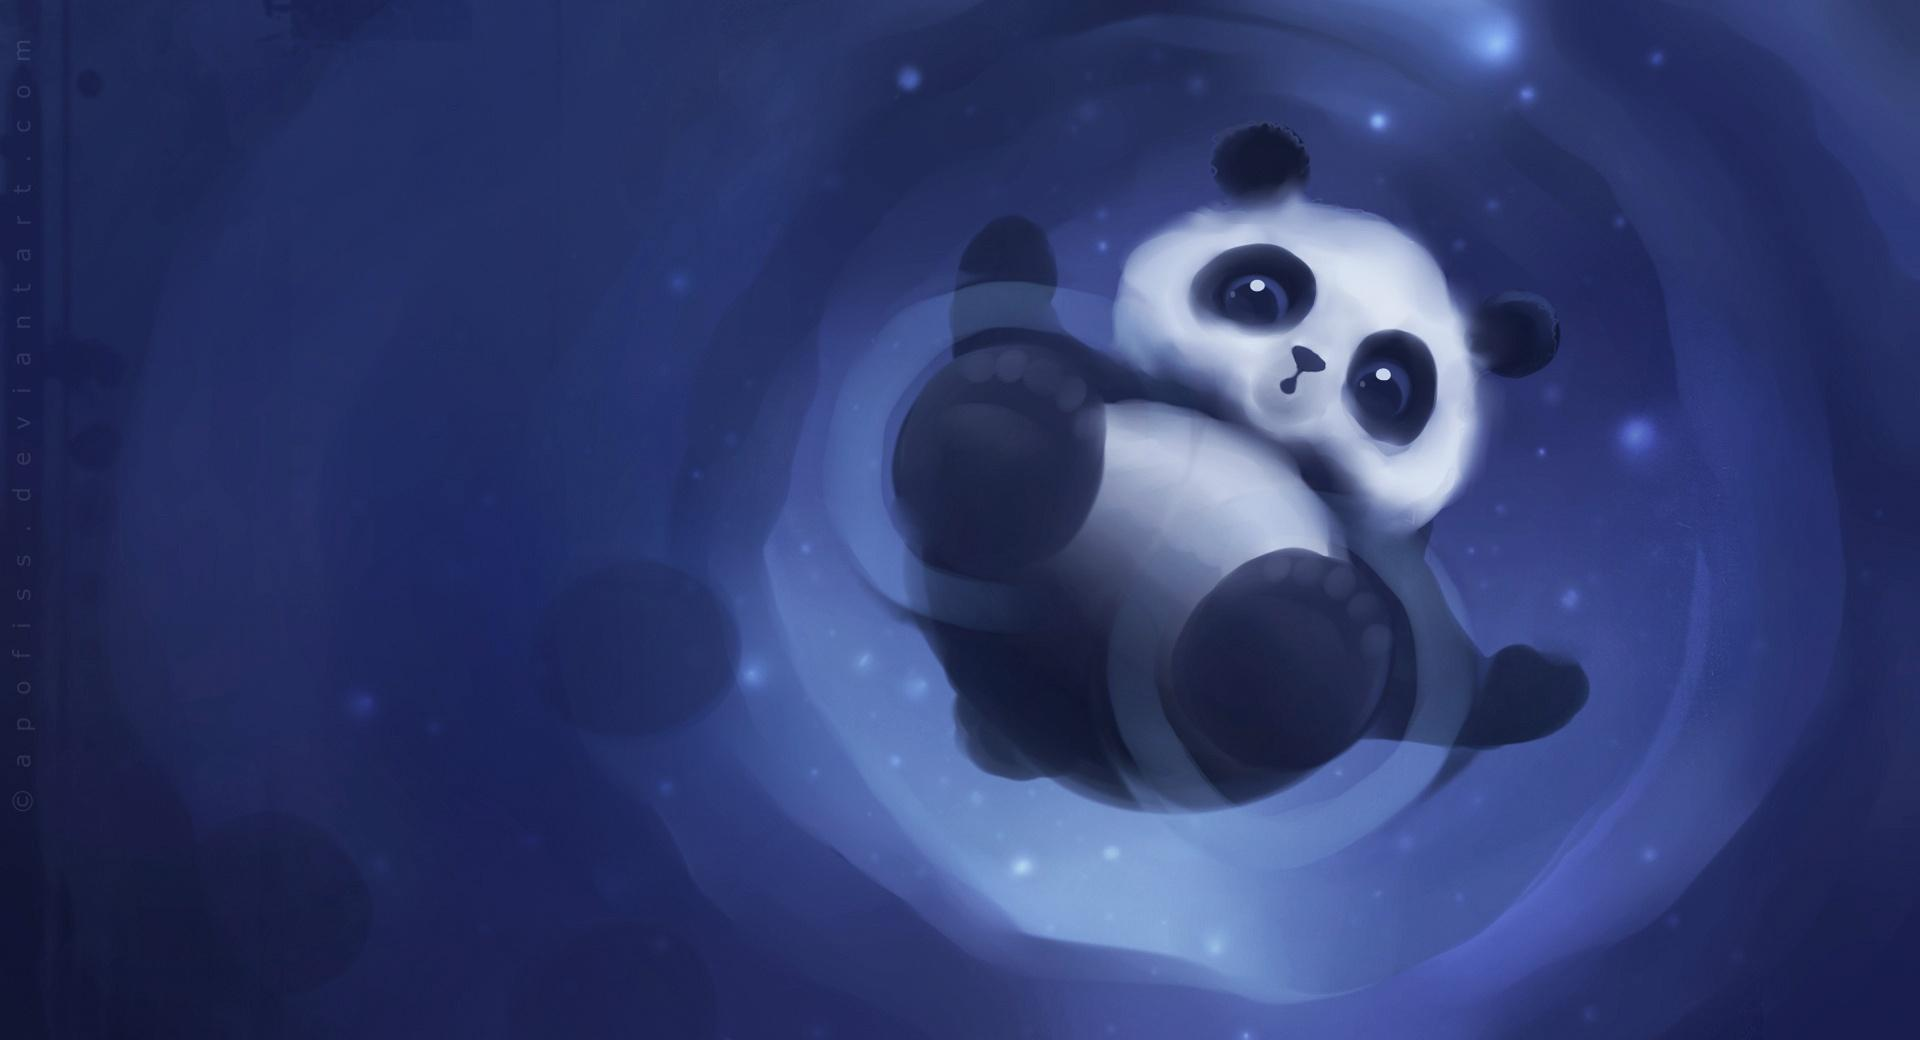 Panda Walking On Water wallpapers HD quality